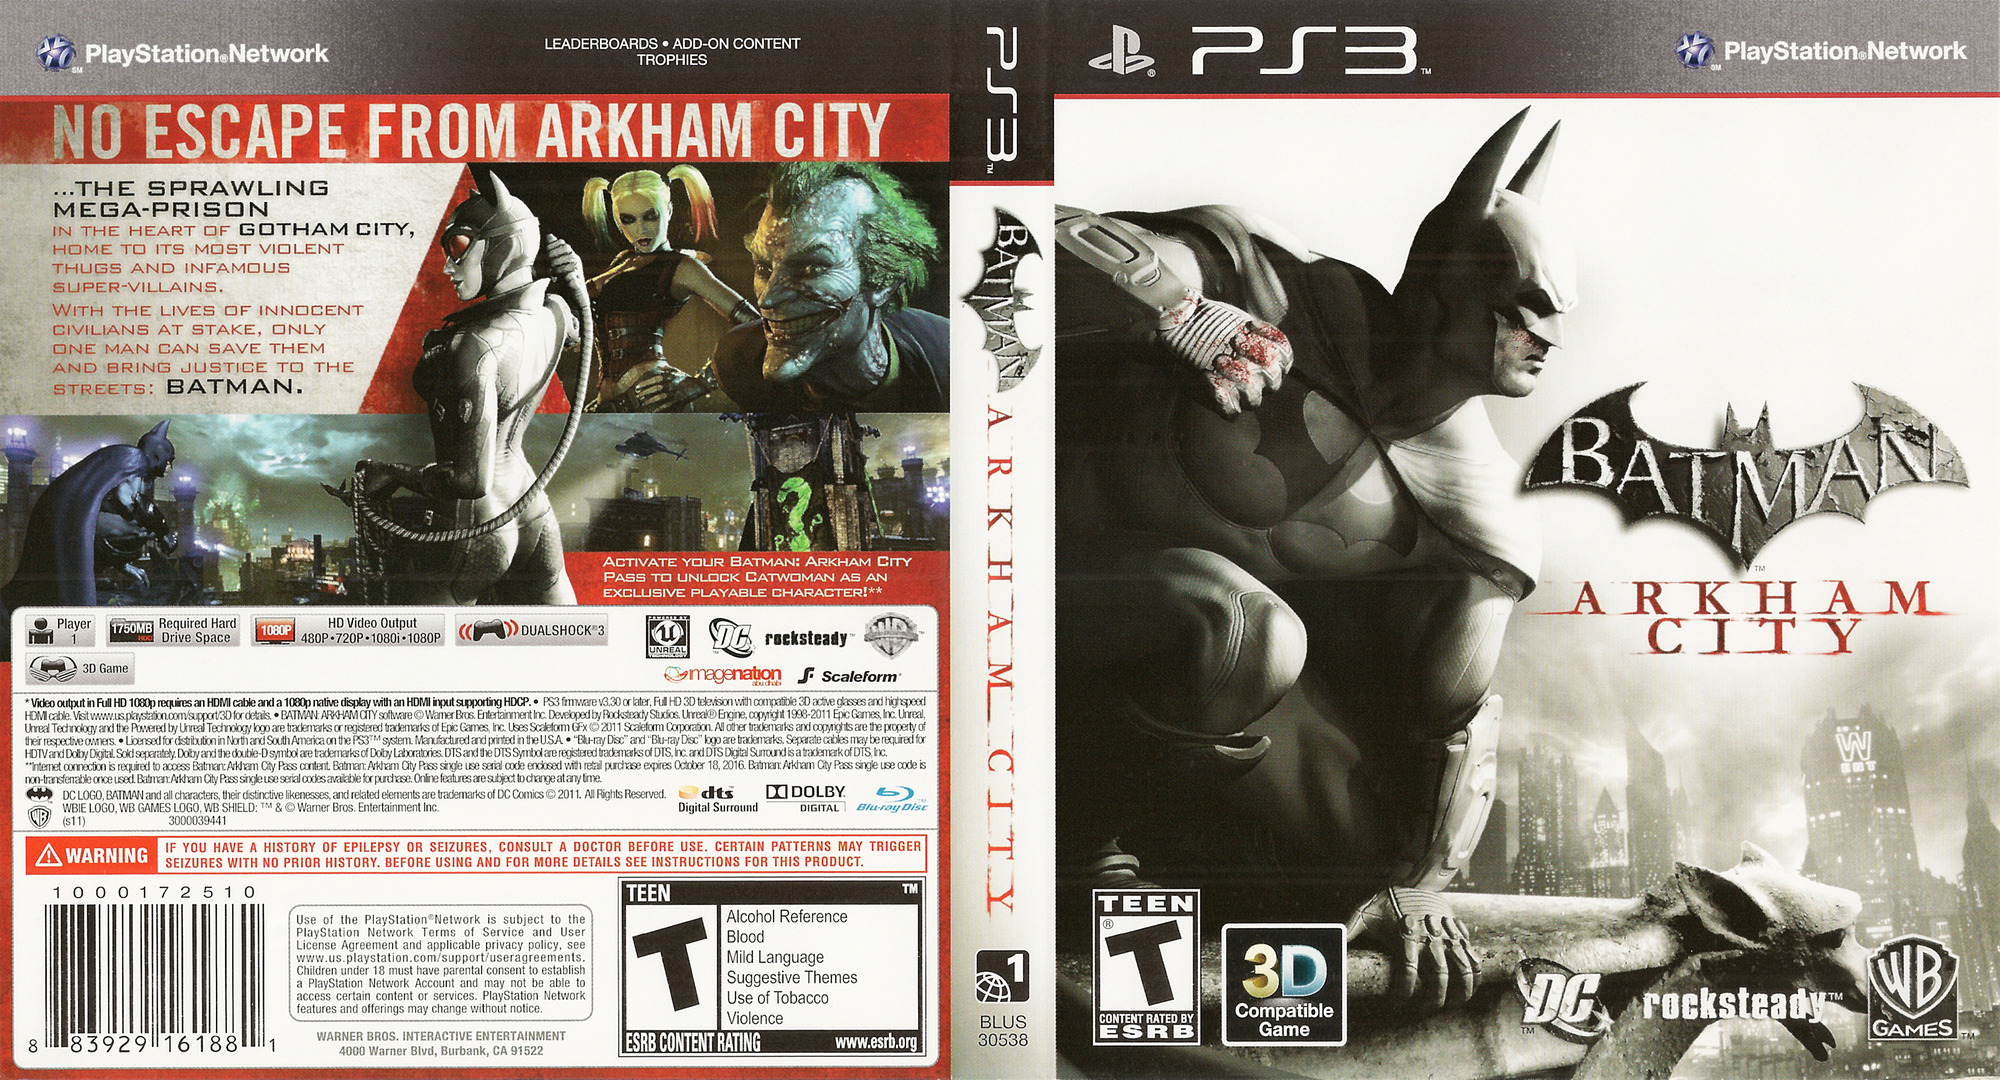 Blus30538 Batman Arkham City